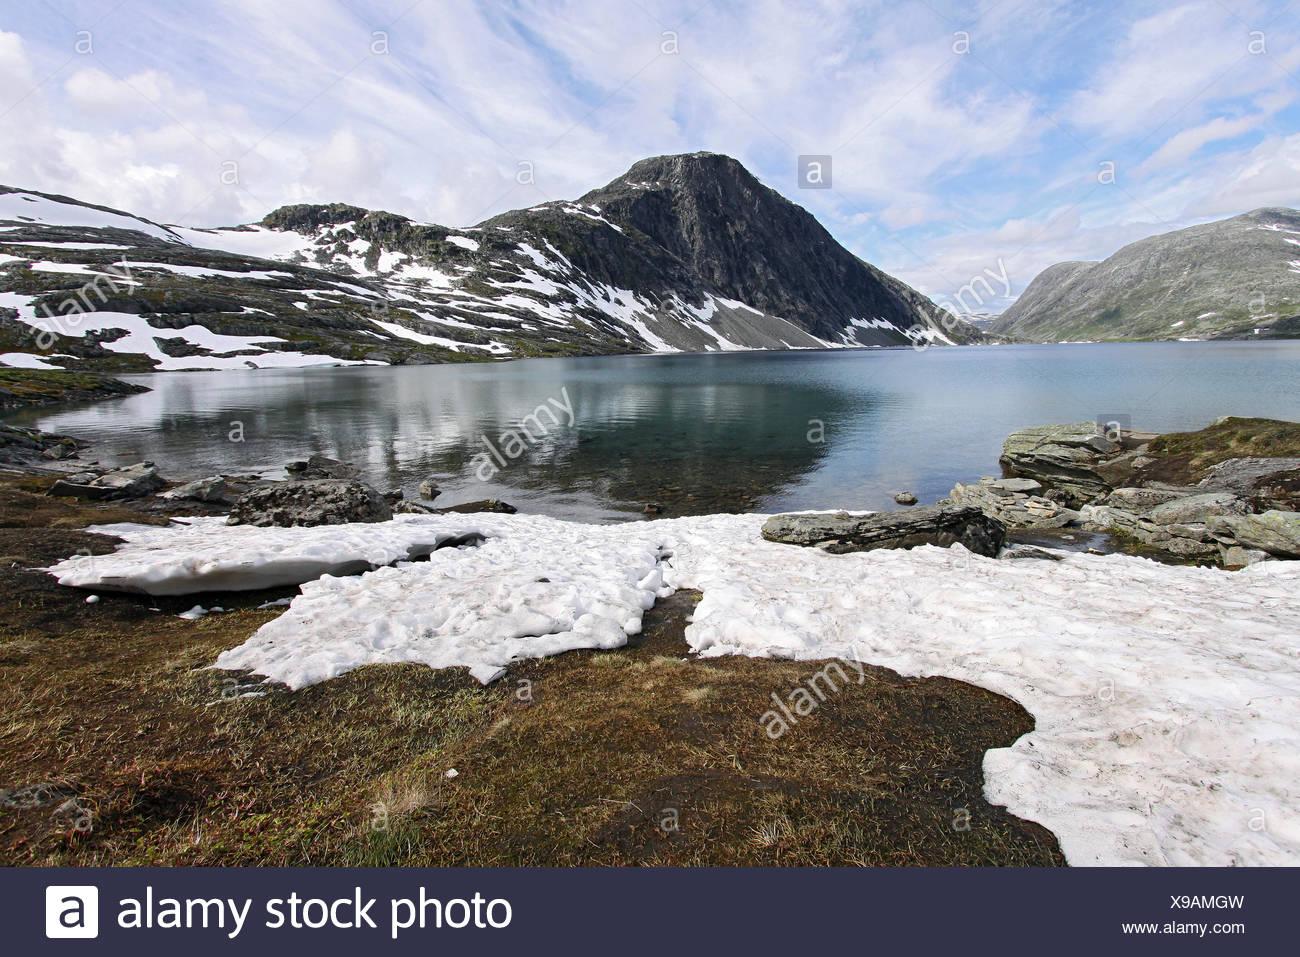 Lake Djupvatnet, Dalsnibba, More og Romsdal, Norway - Stock Image